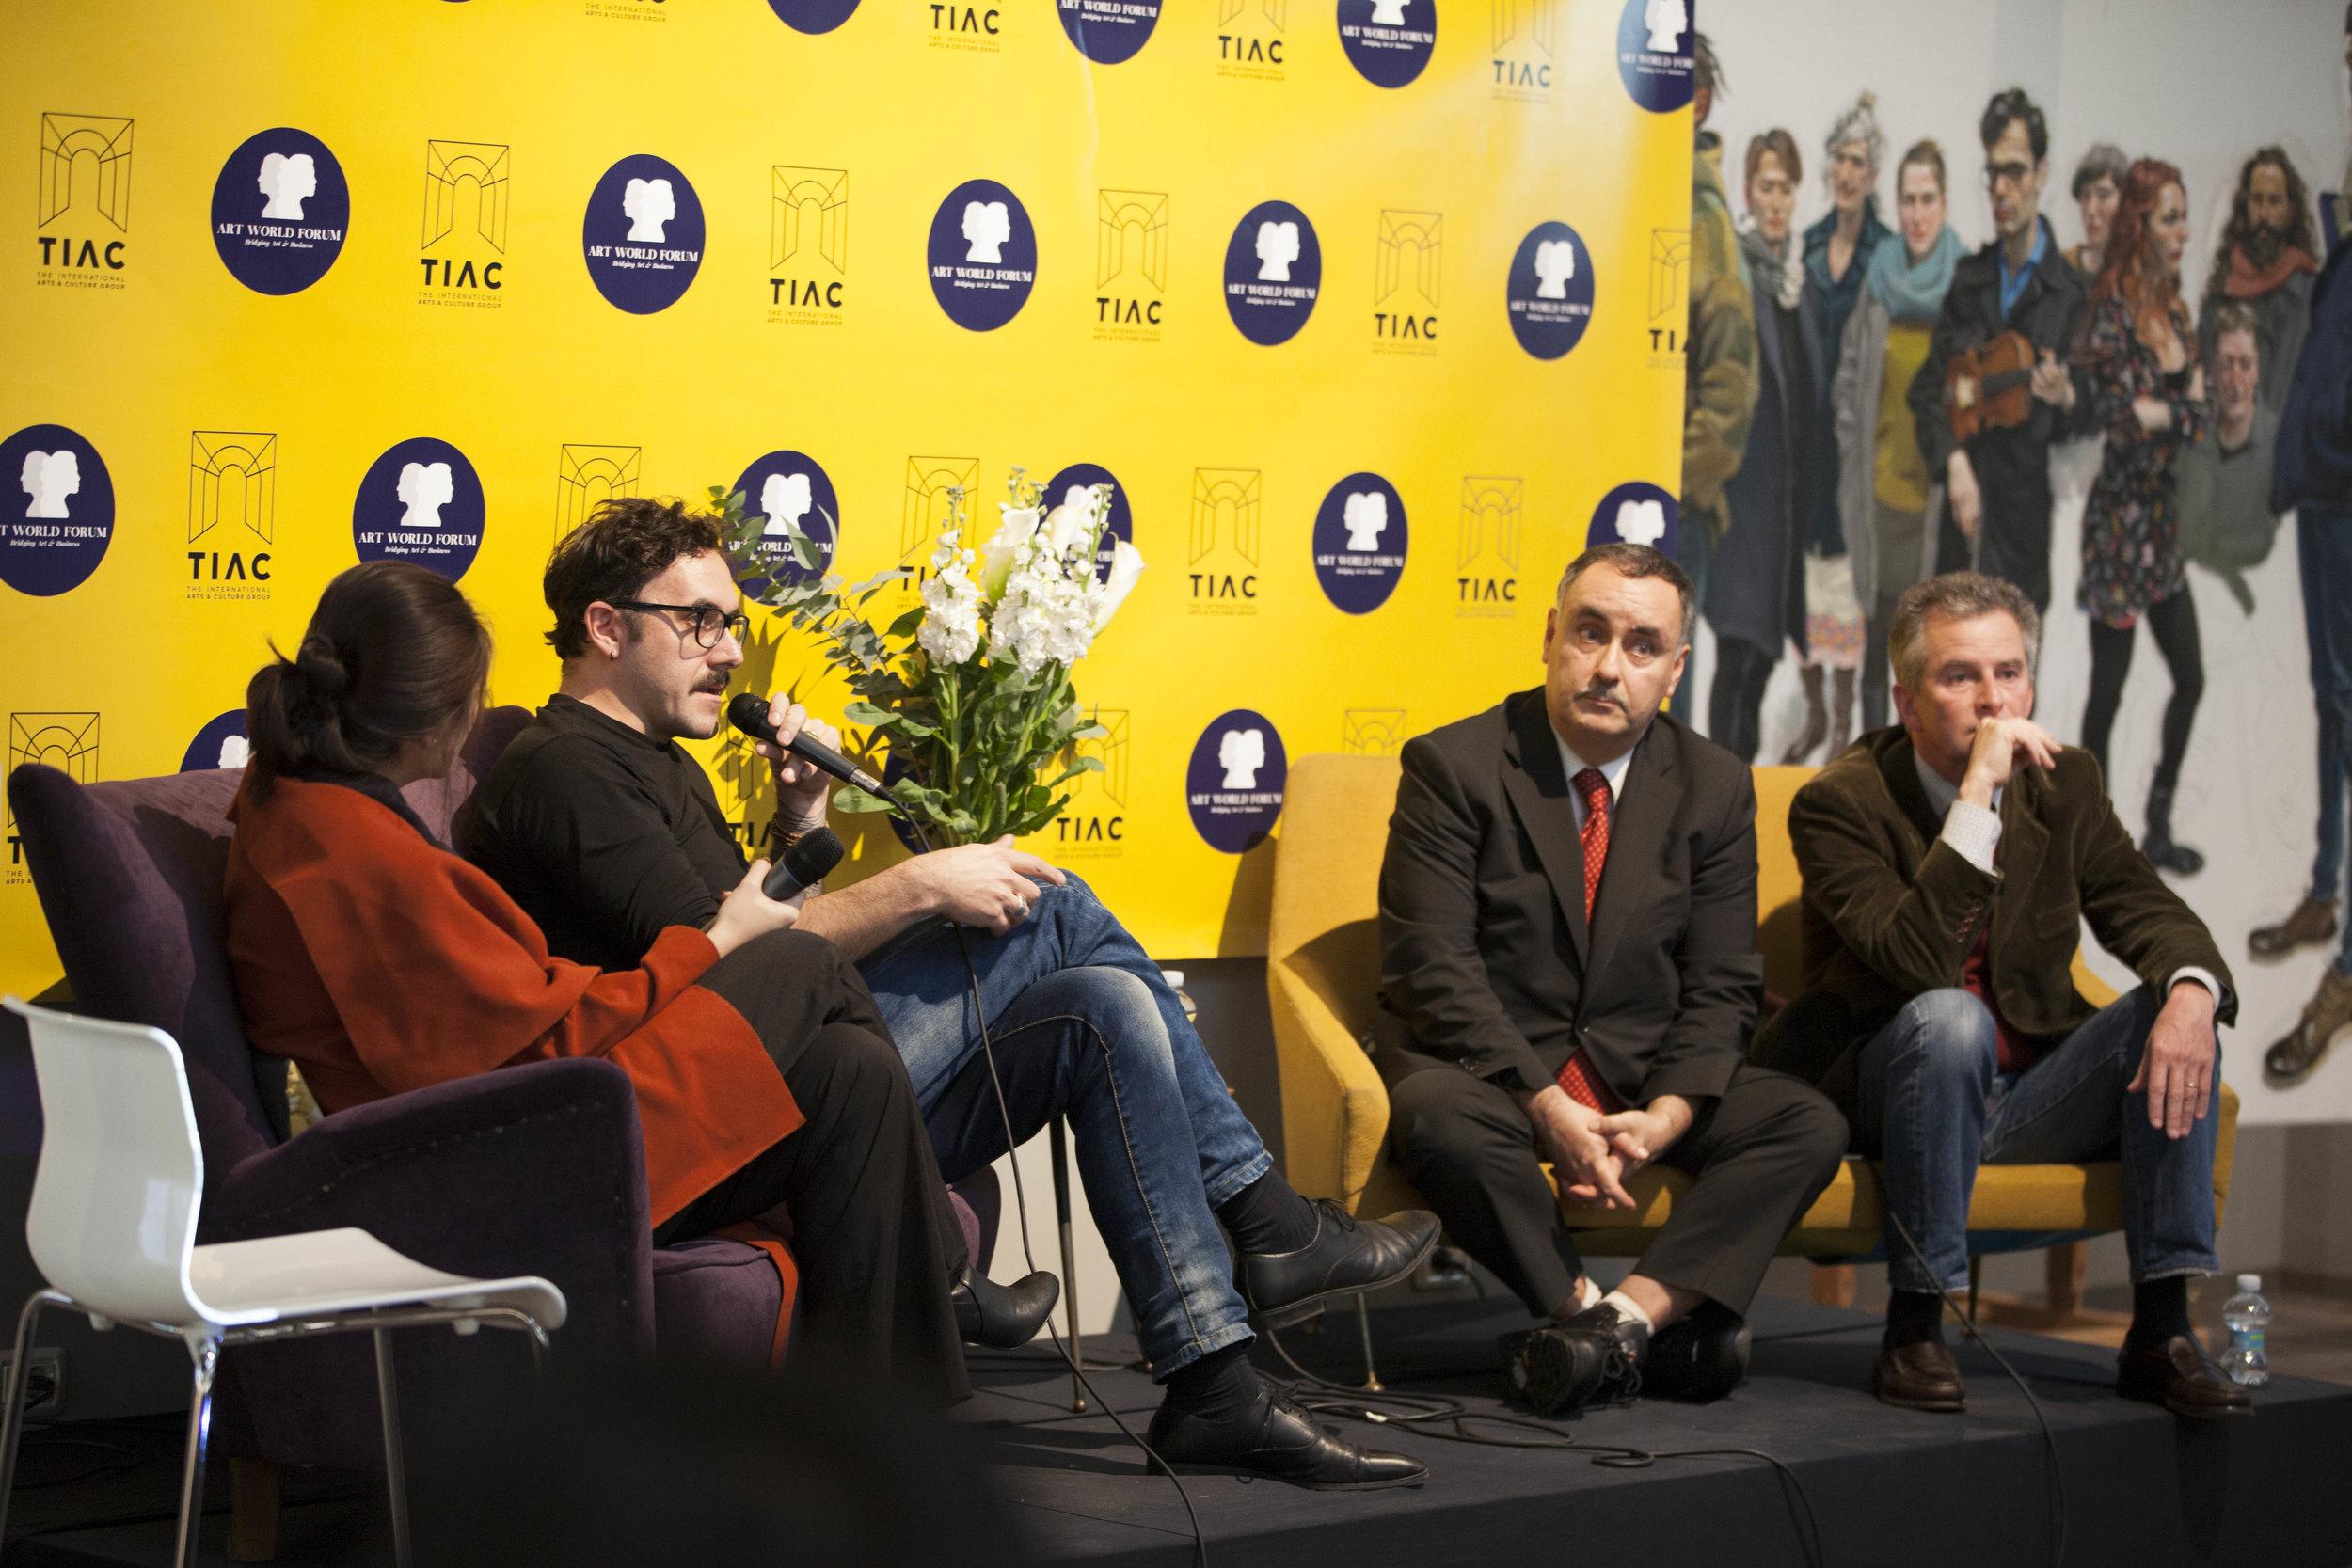 Emiliano Galiani,Emanuele Barletti,Giandomenico Semeraro